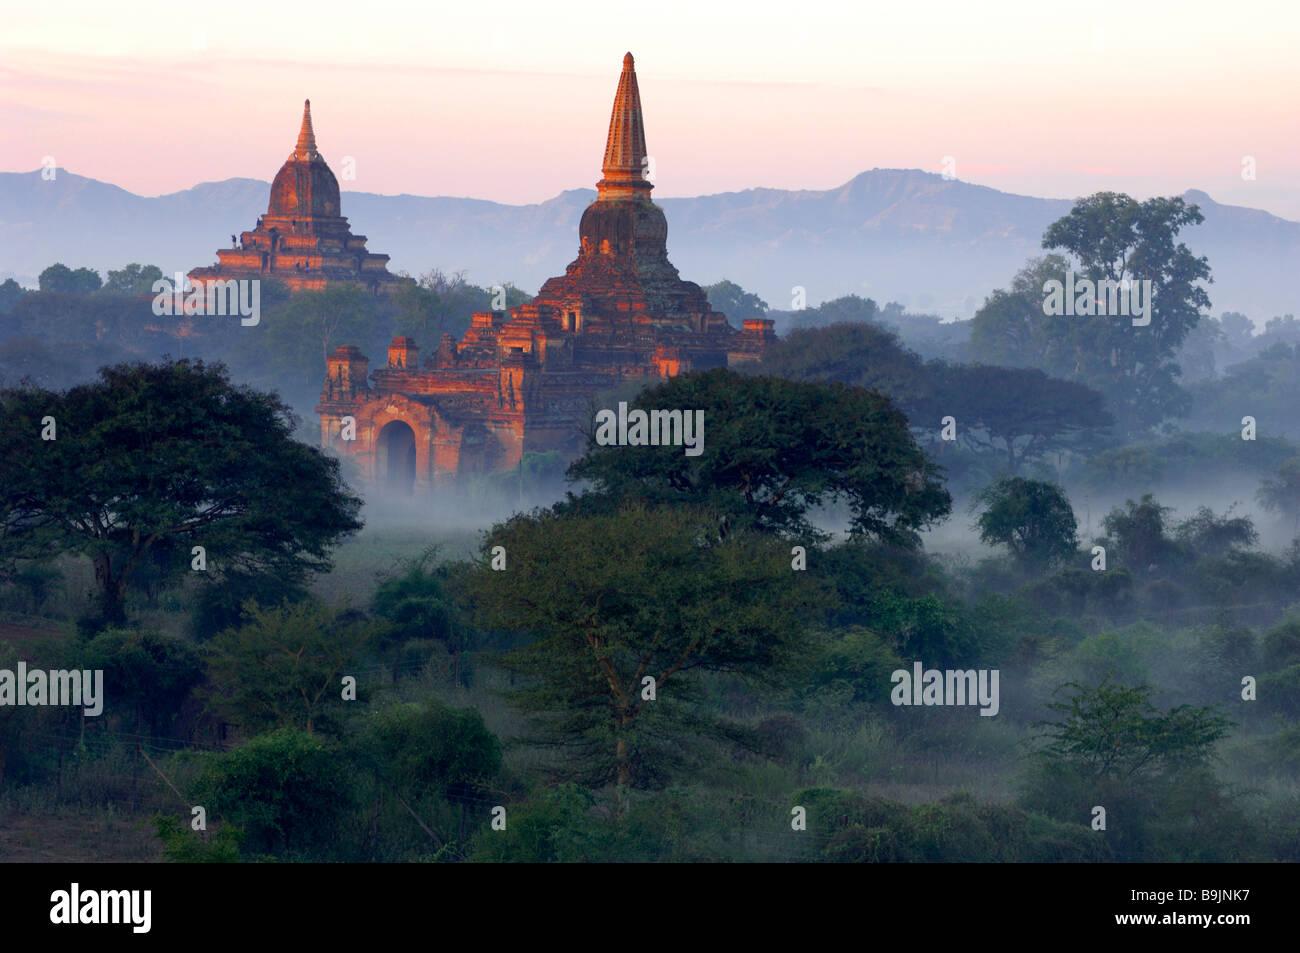 the ancient temple city of Pagan Bagan at Myanmar Burma Birma - Stock Image